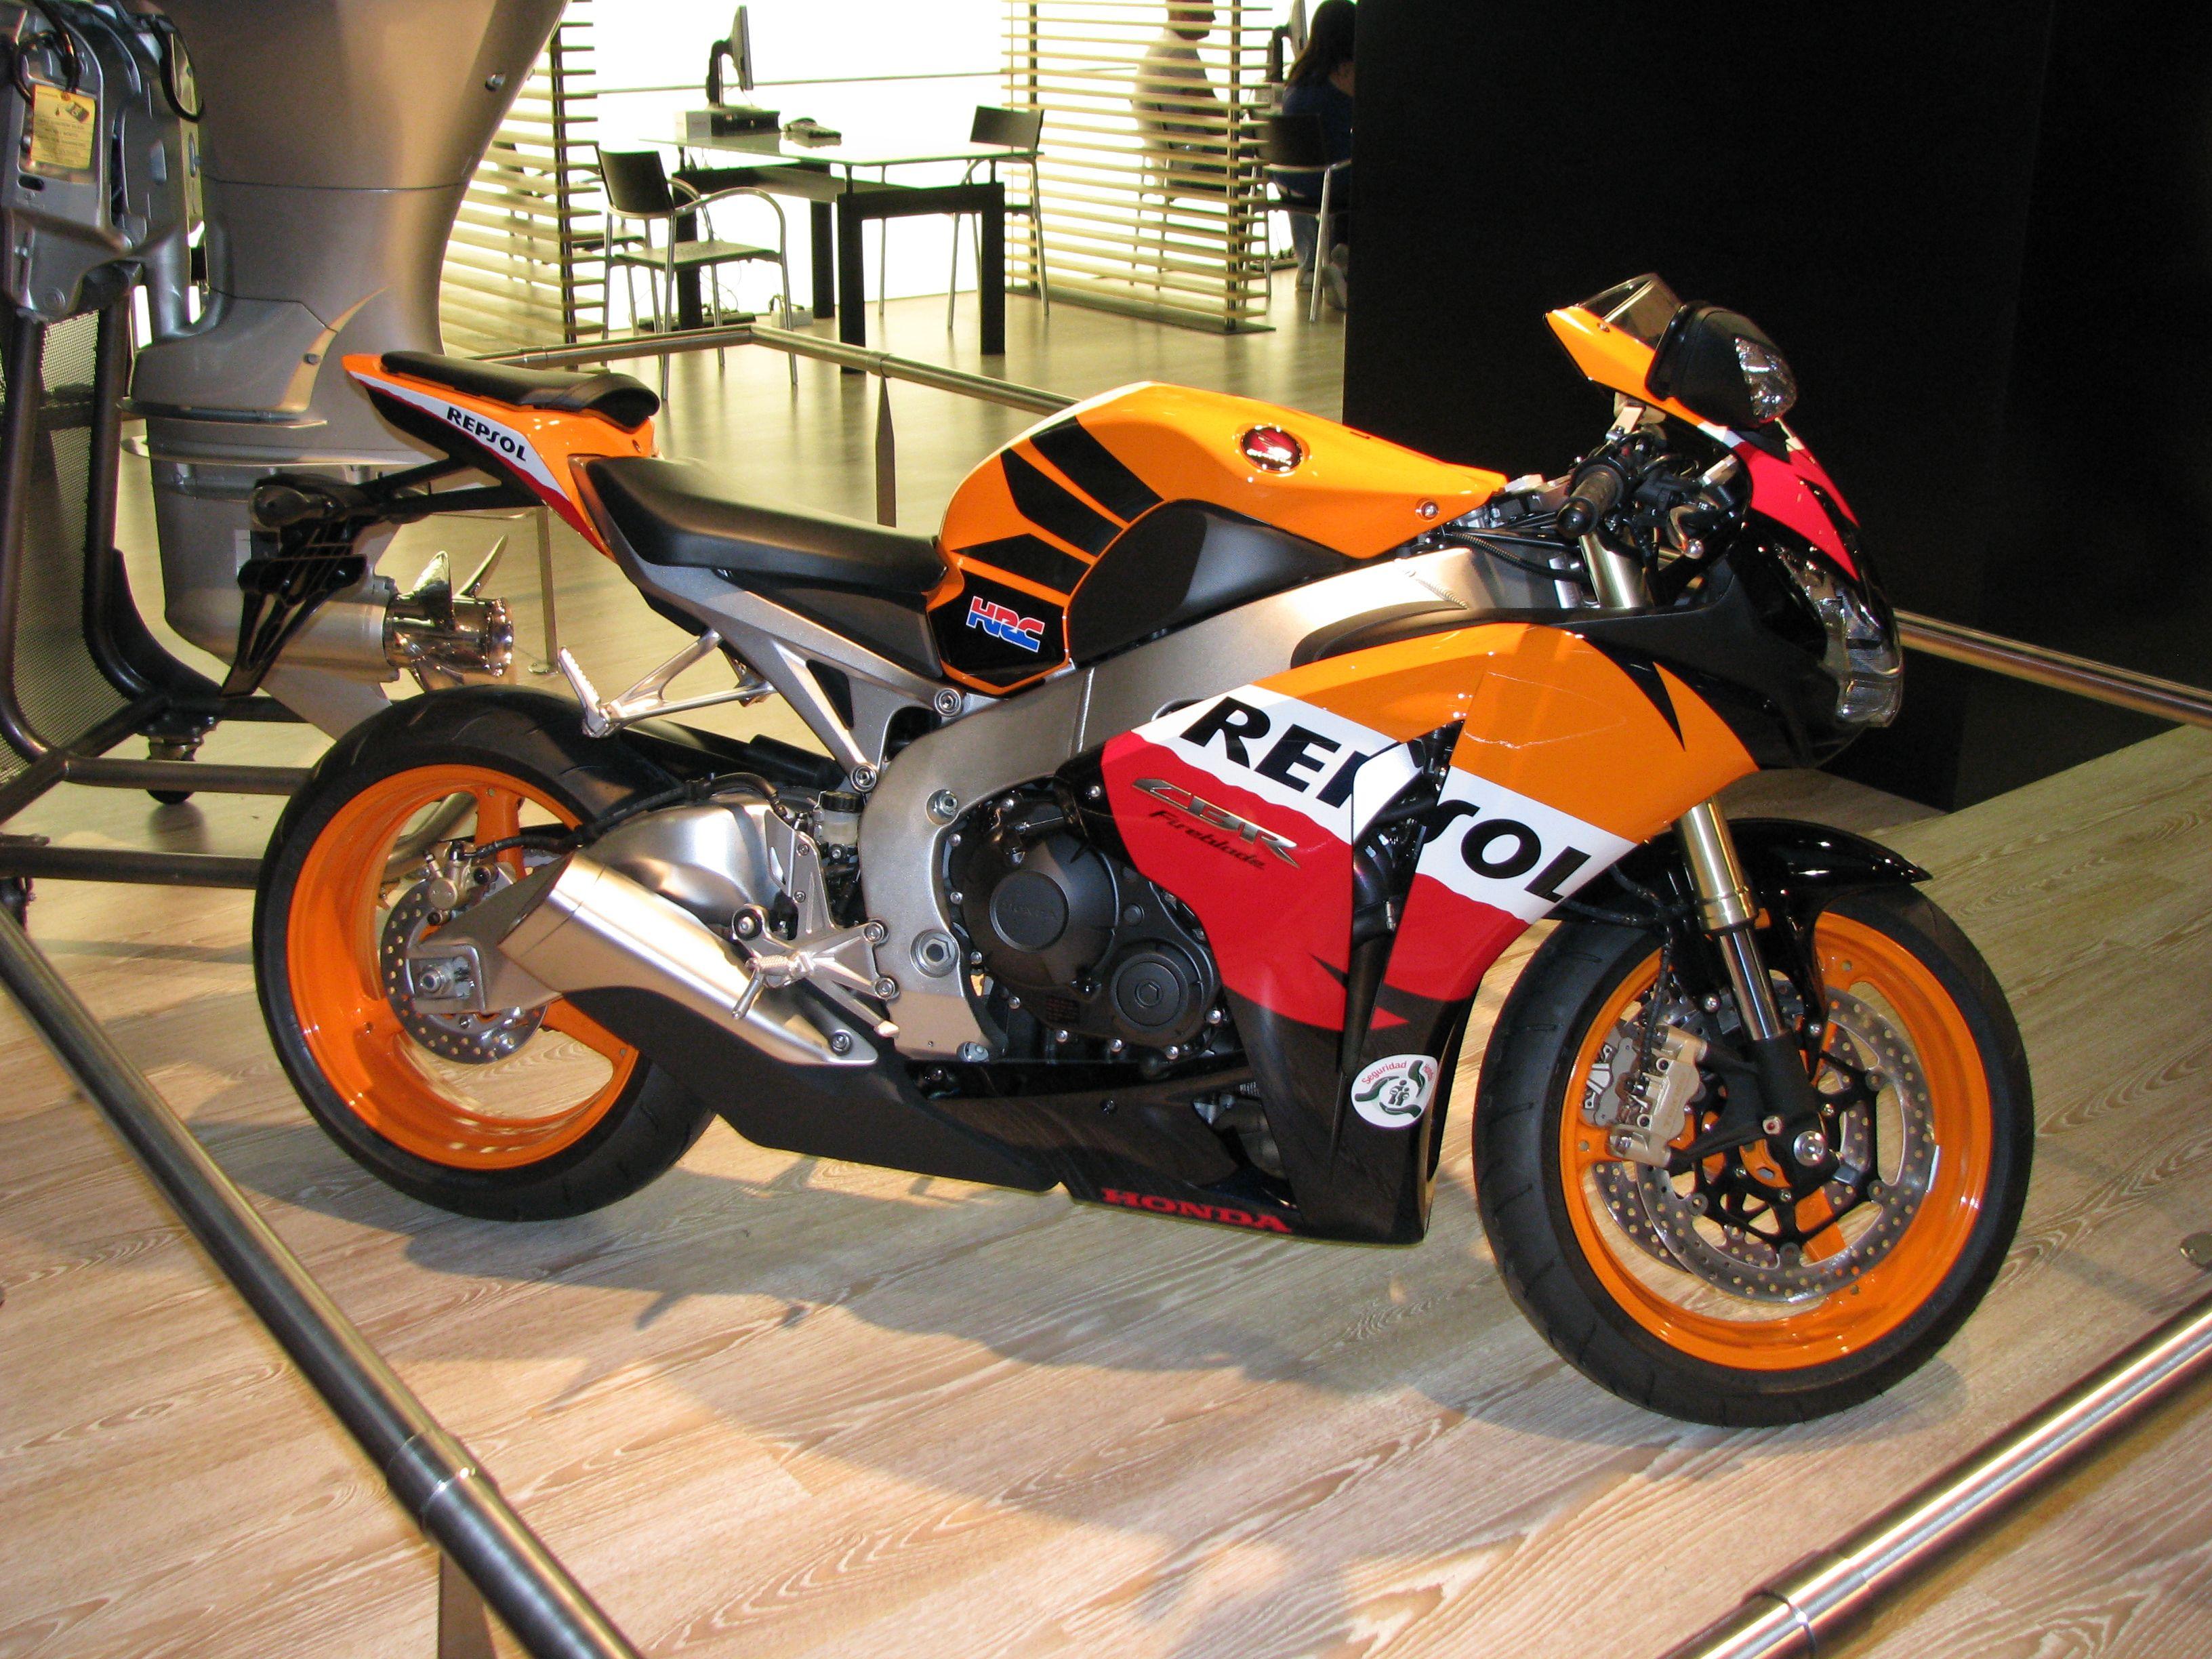 Cool bike 2014 honda cbr1000rr cycleonline news motocycles car modification pinterest cbr honda and cars